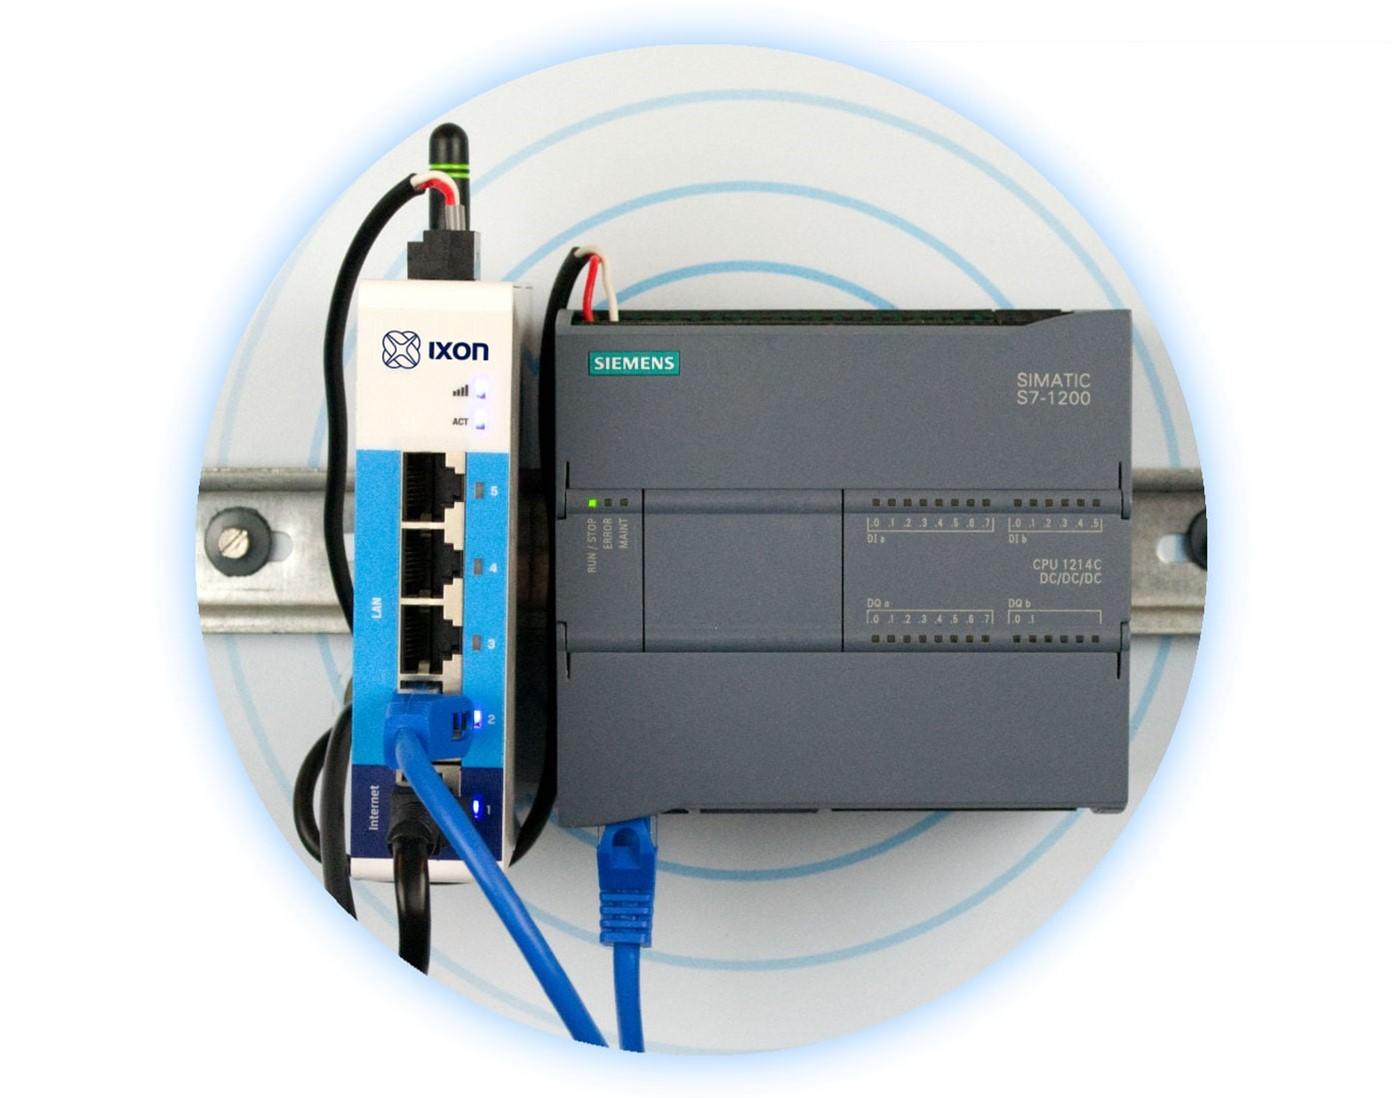 Toegang op afstand voor Siemens PLC